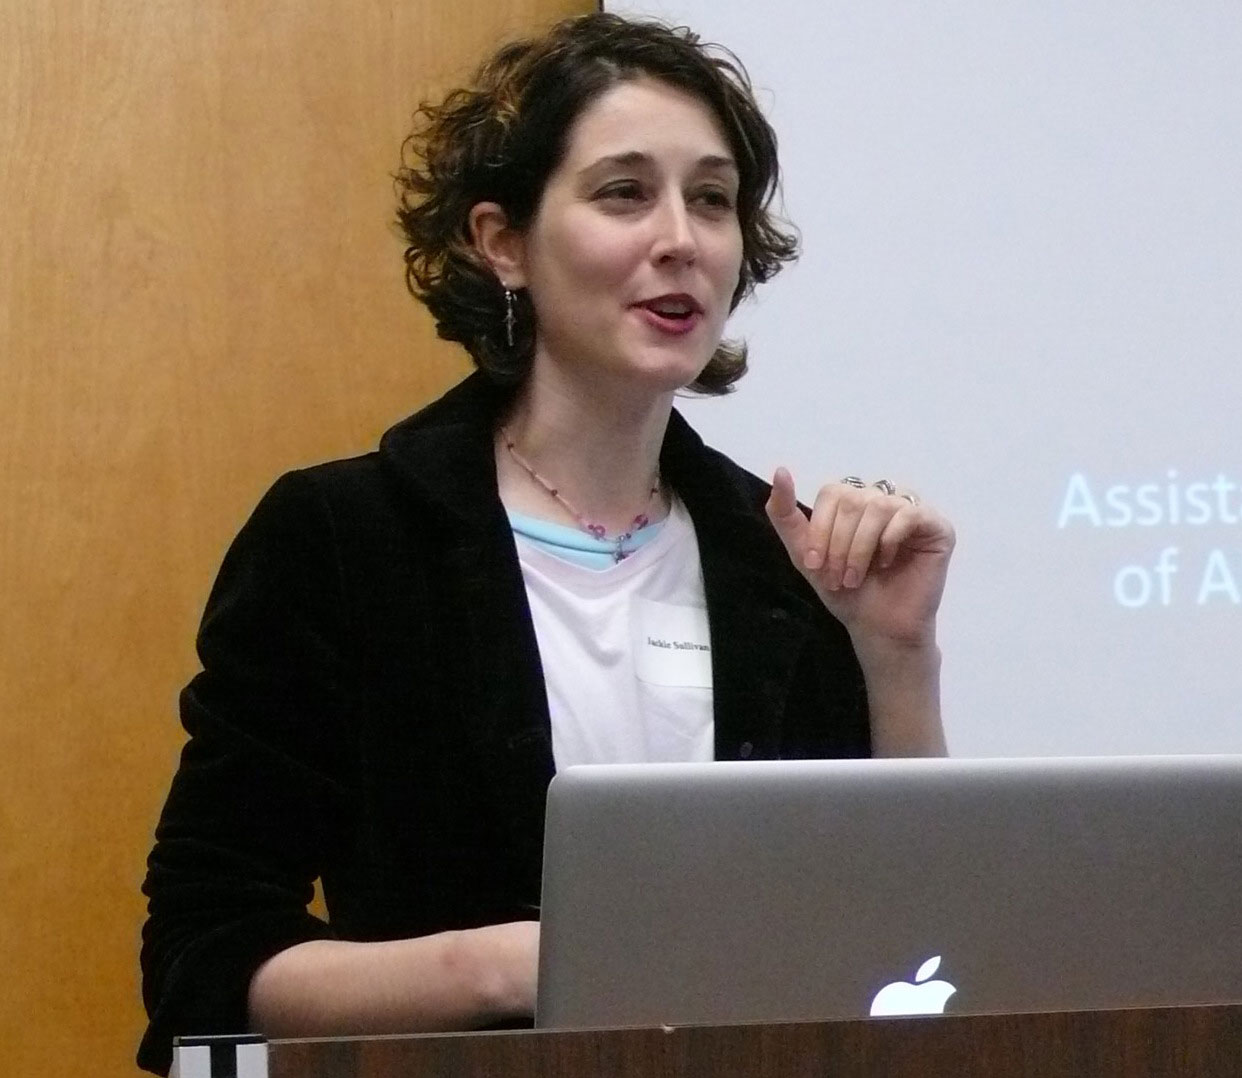 Jackie Sullivan on Optogenetics, Pluralism, and Progress